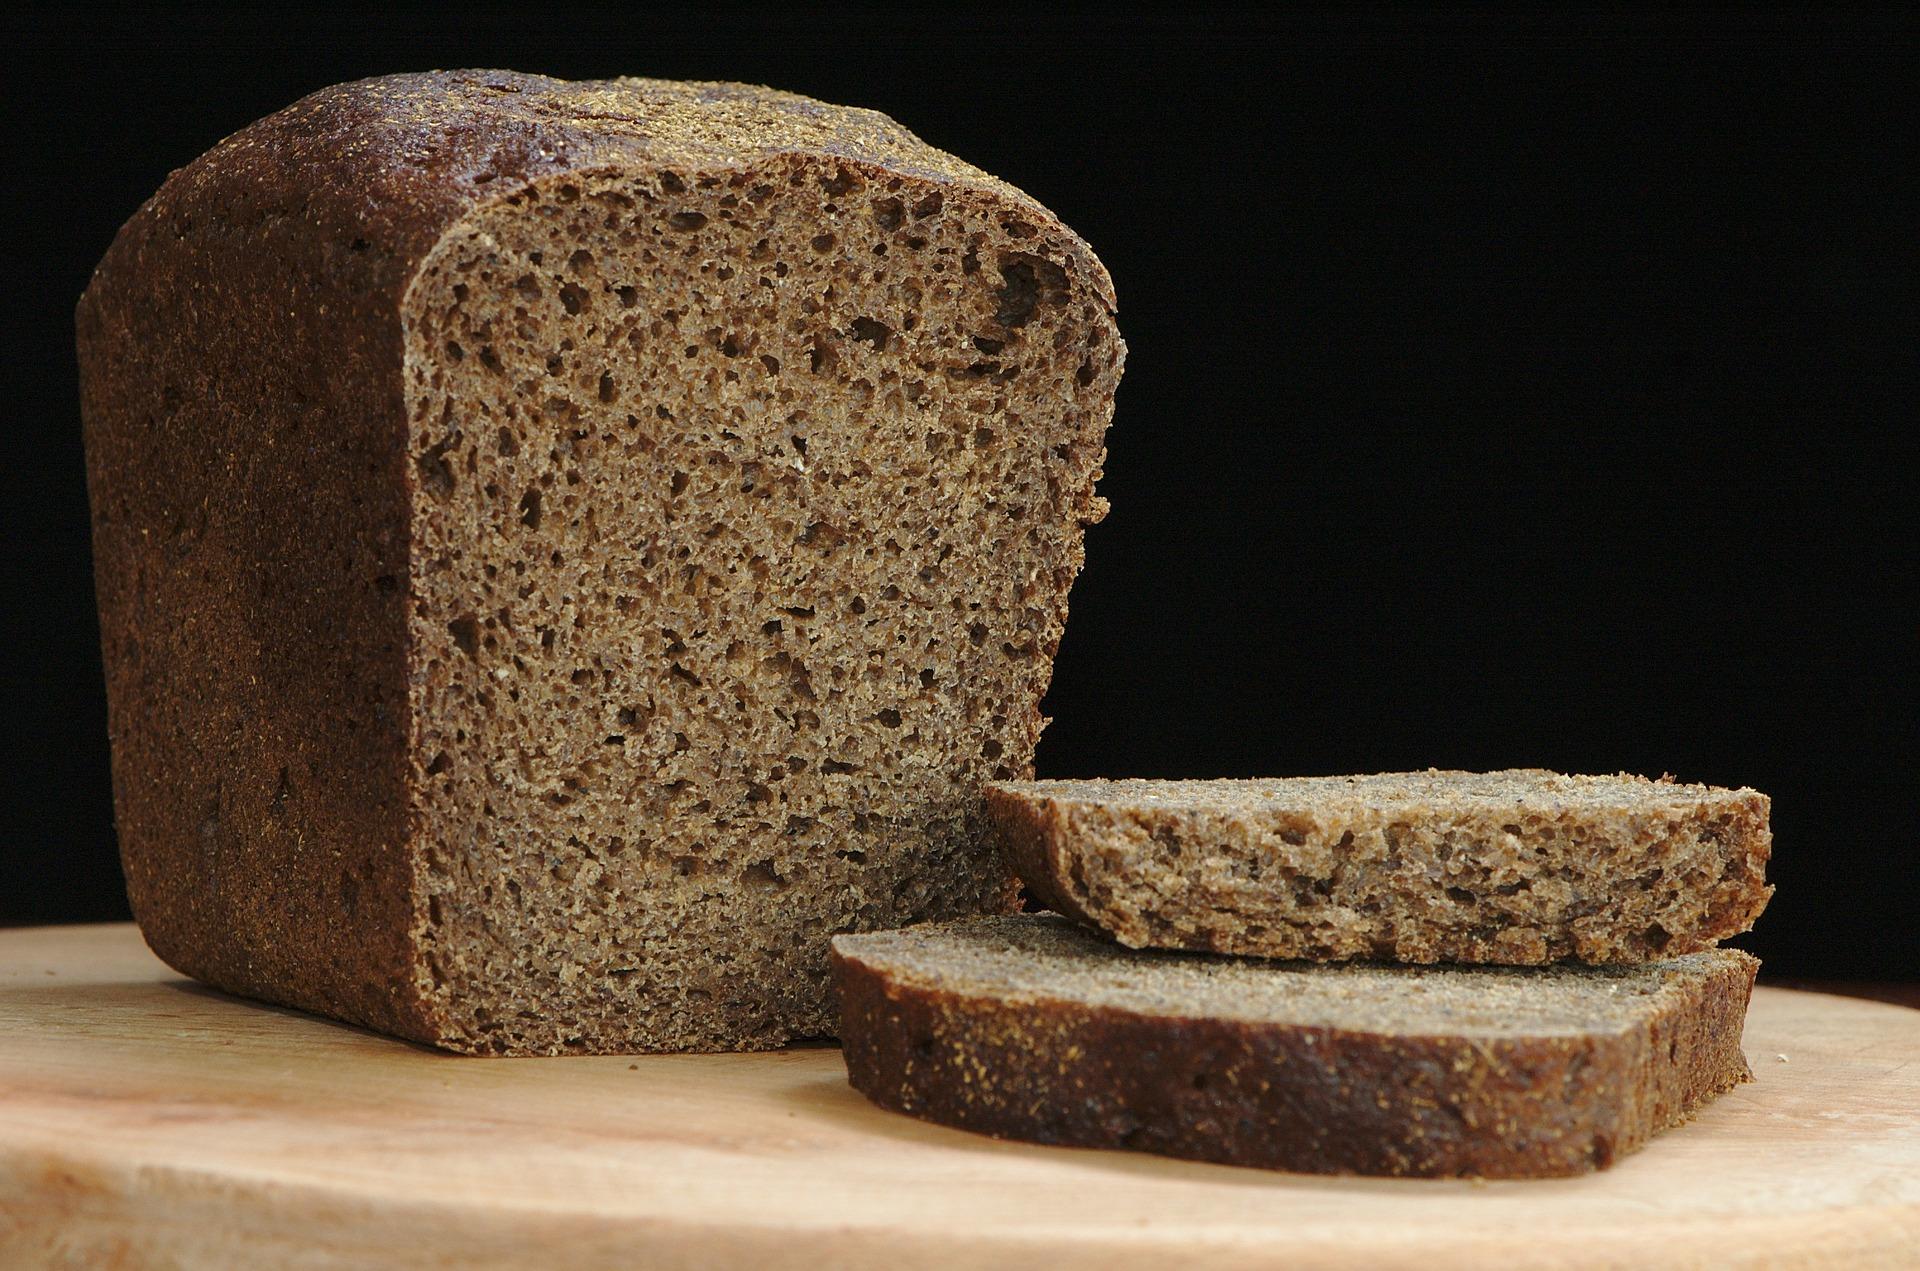 "<a href=""http://www.tonyshatch.co.uk/product/black-rye/"">Black Rye Bread With Avocado</a>"